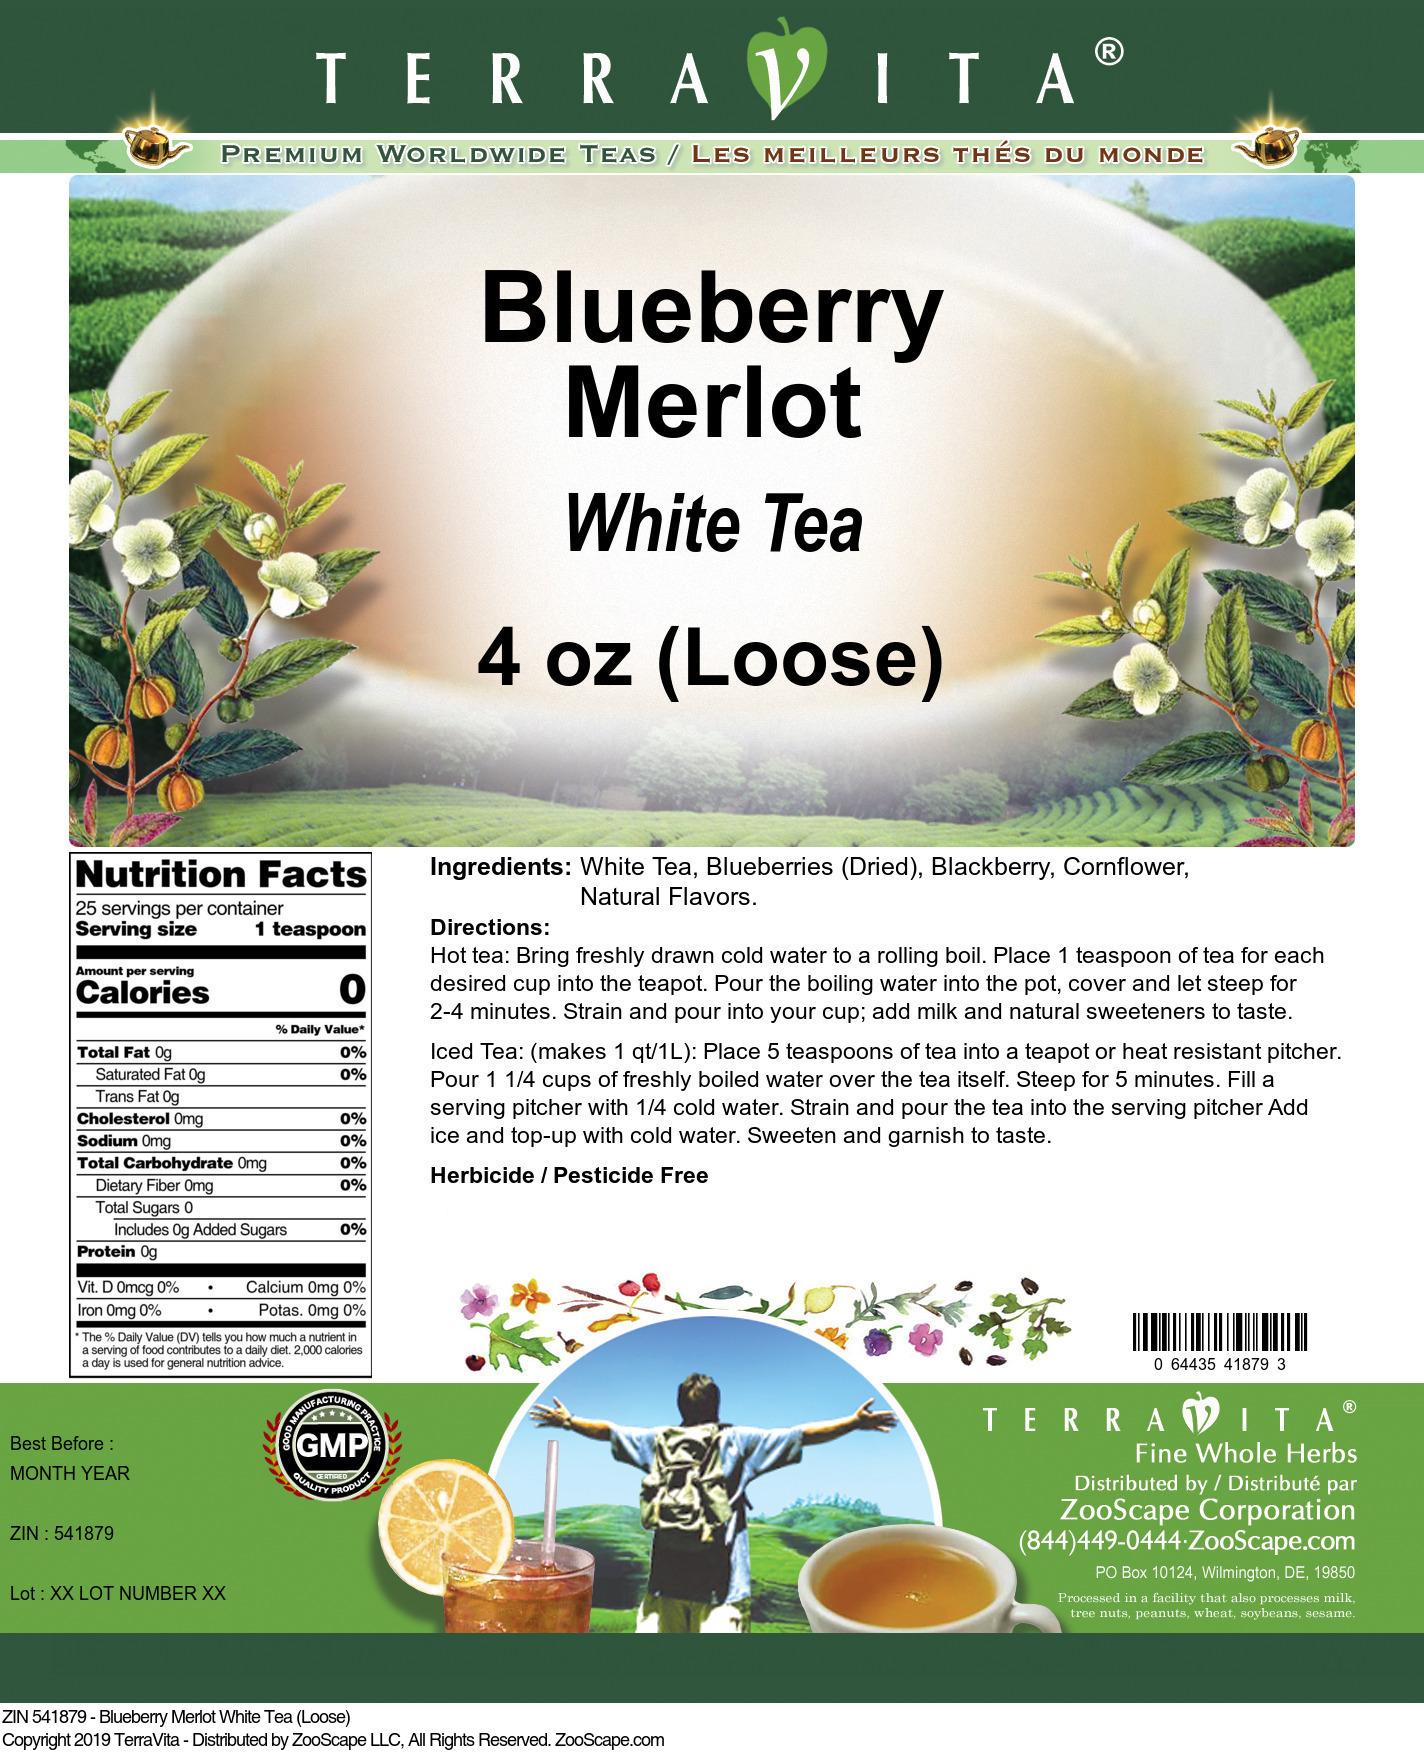 Blueberry Merlot White Tea (Loose)